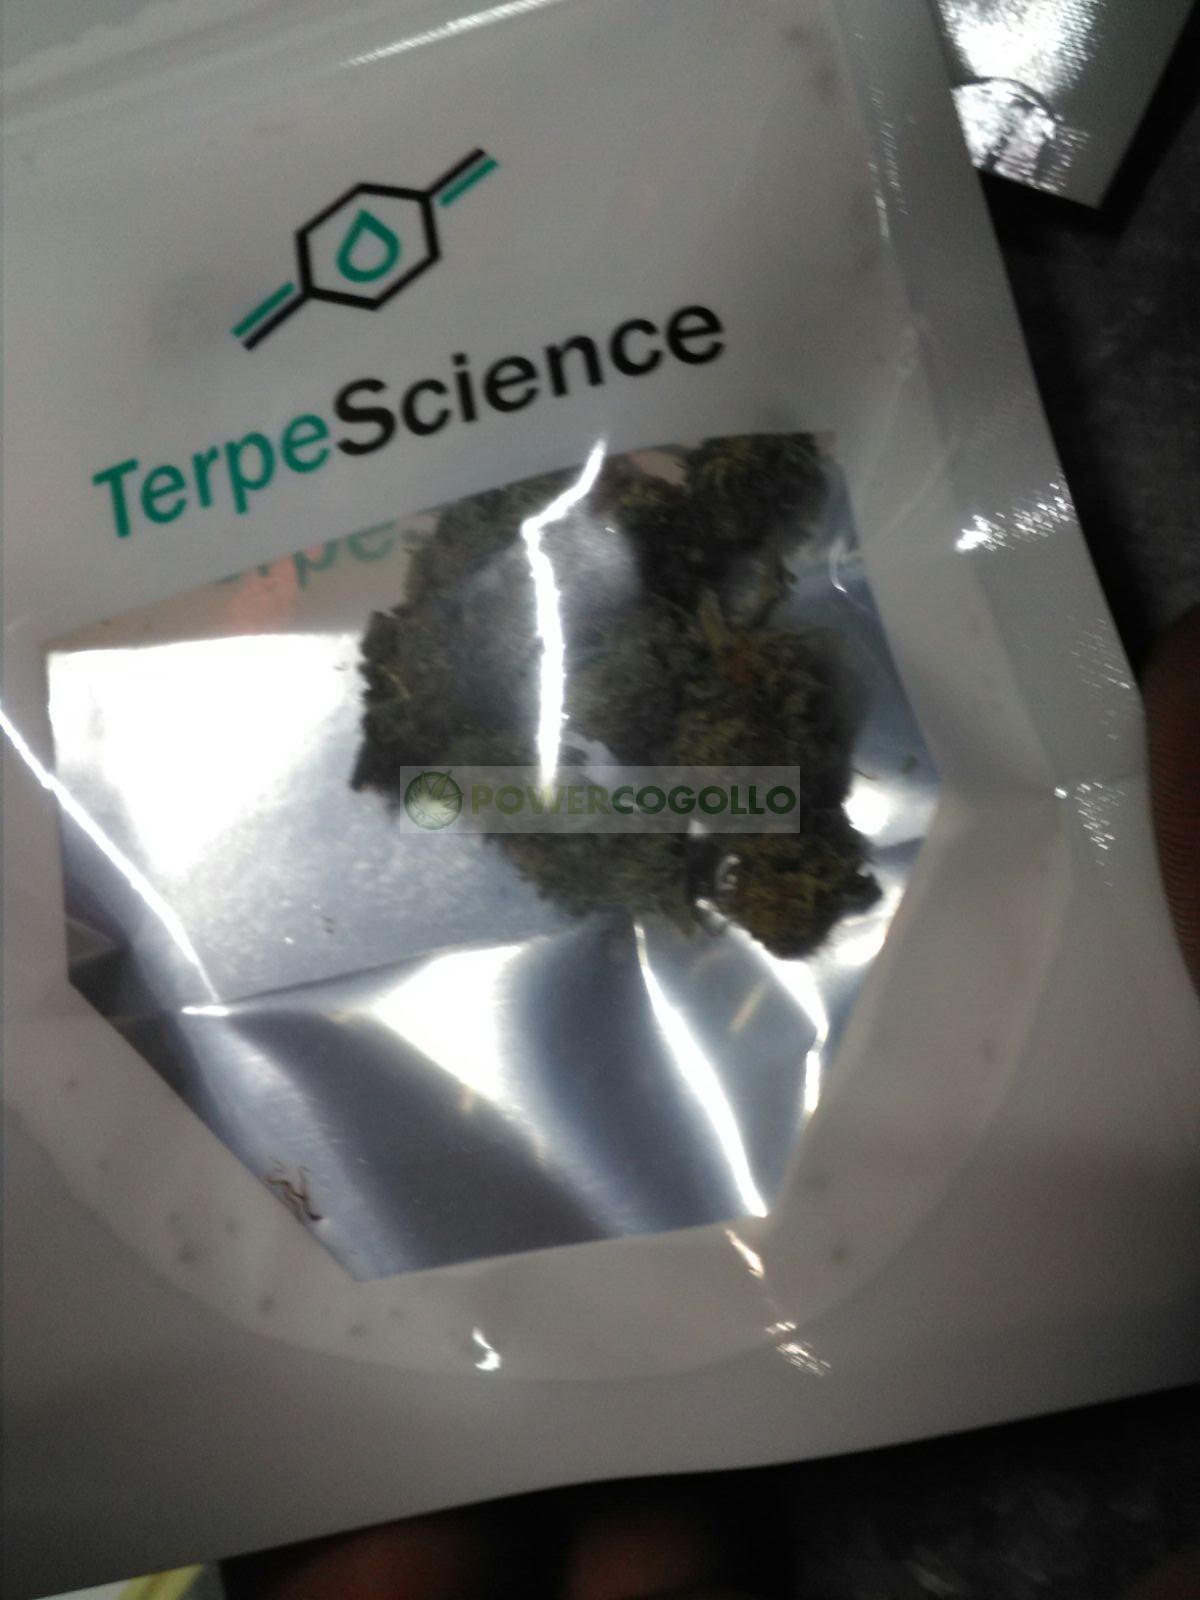 Flores CBD (TerpeScience) 3